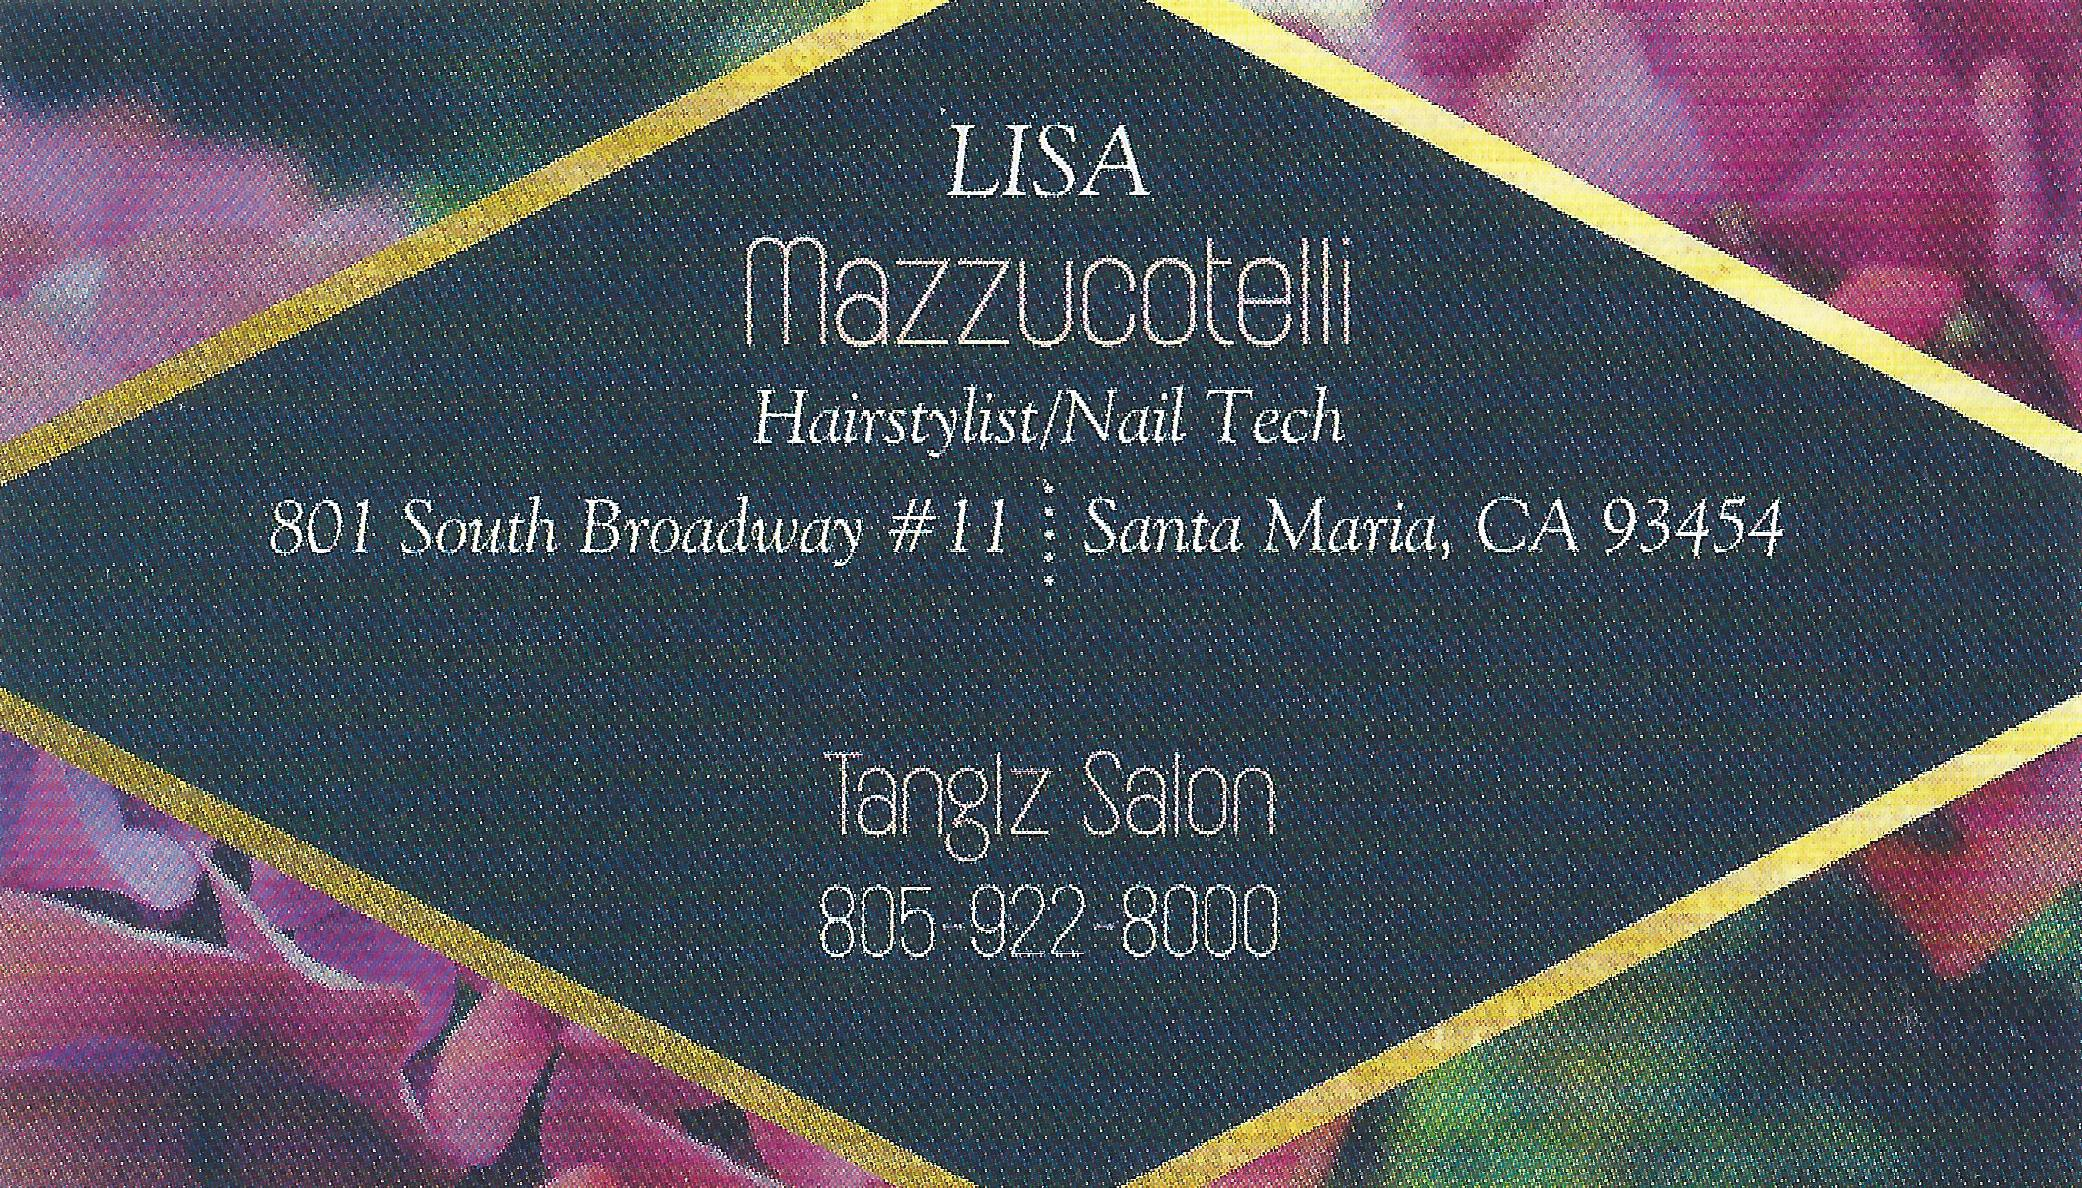 Lisa Mazzucotelli